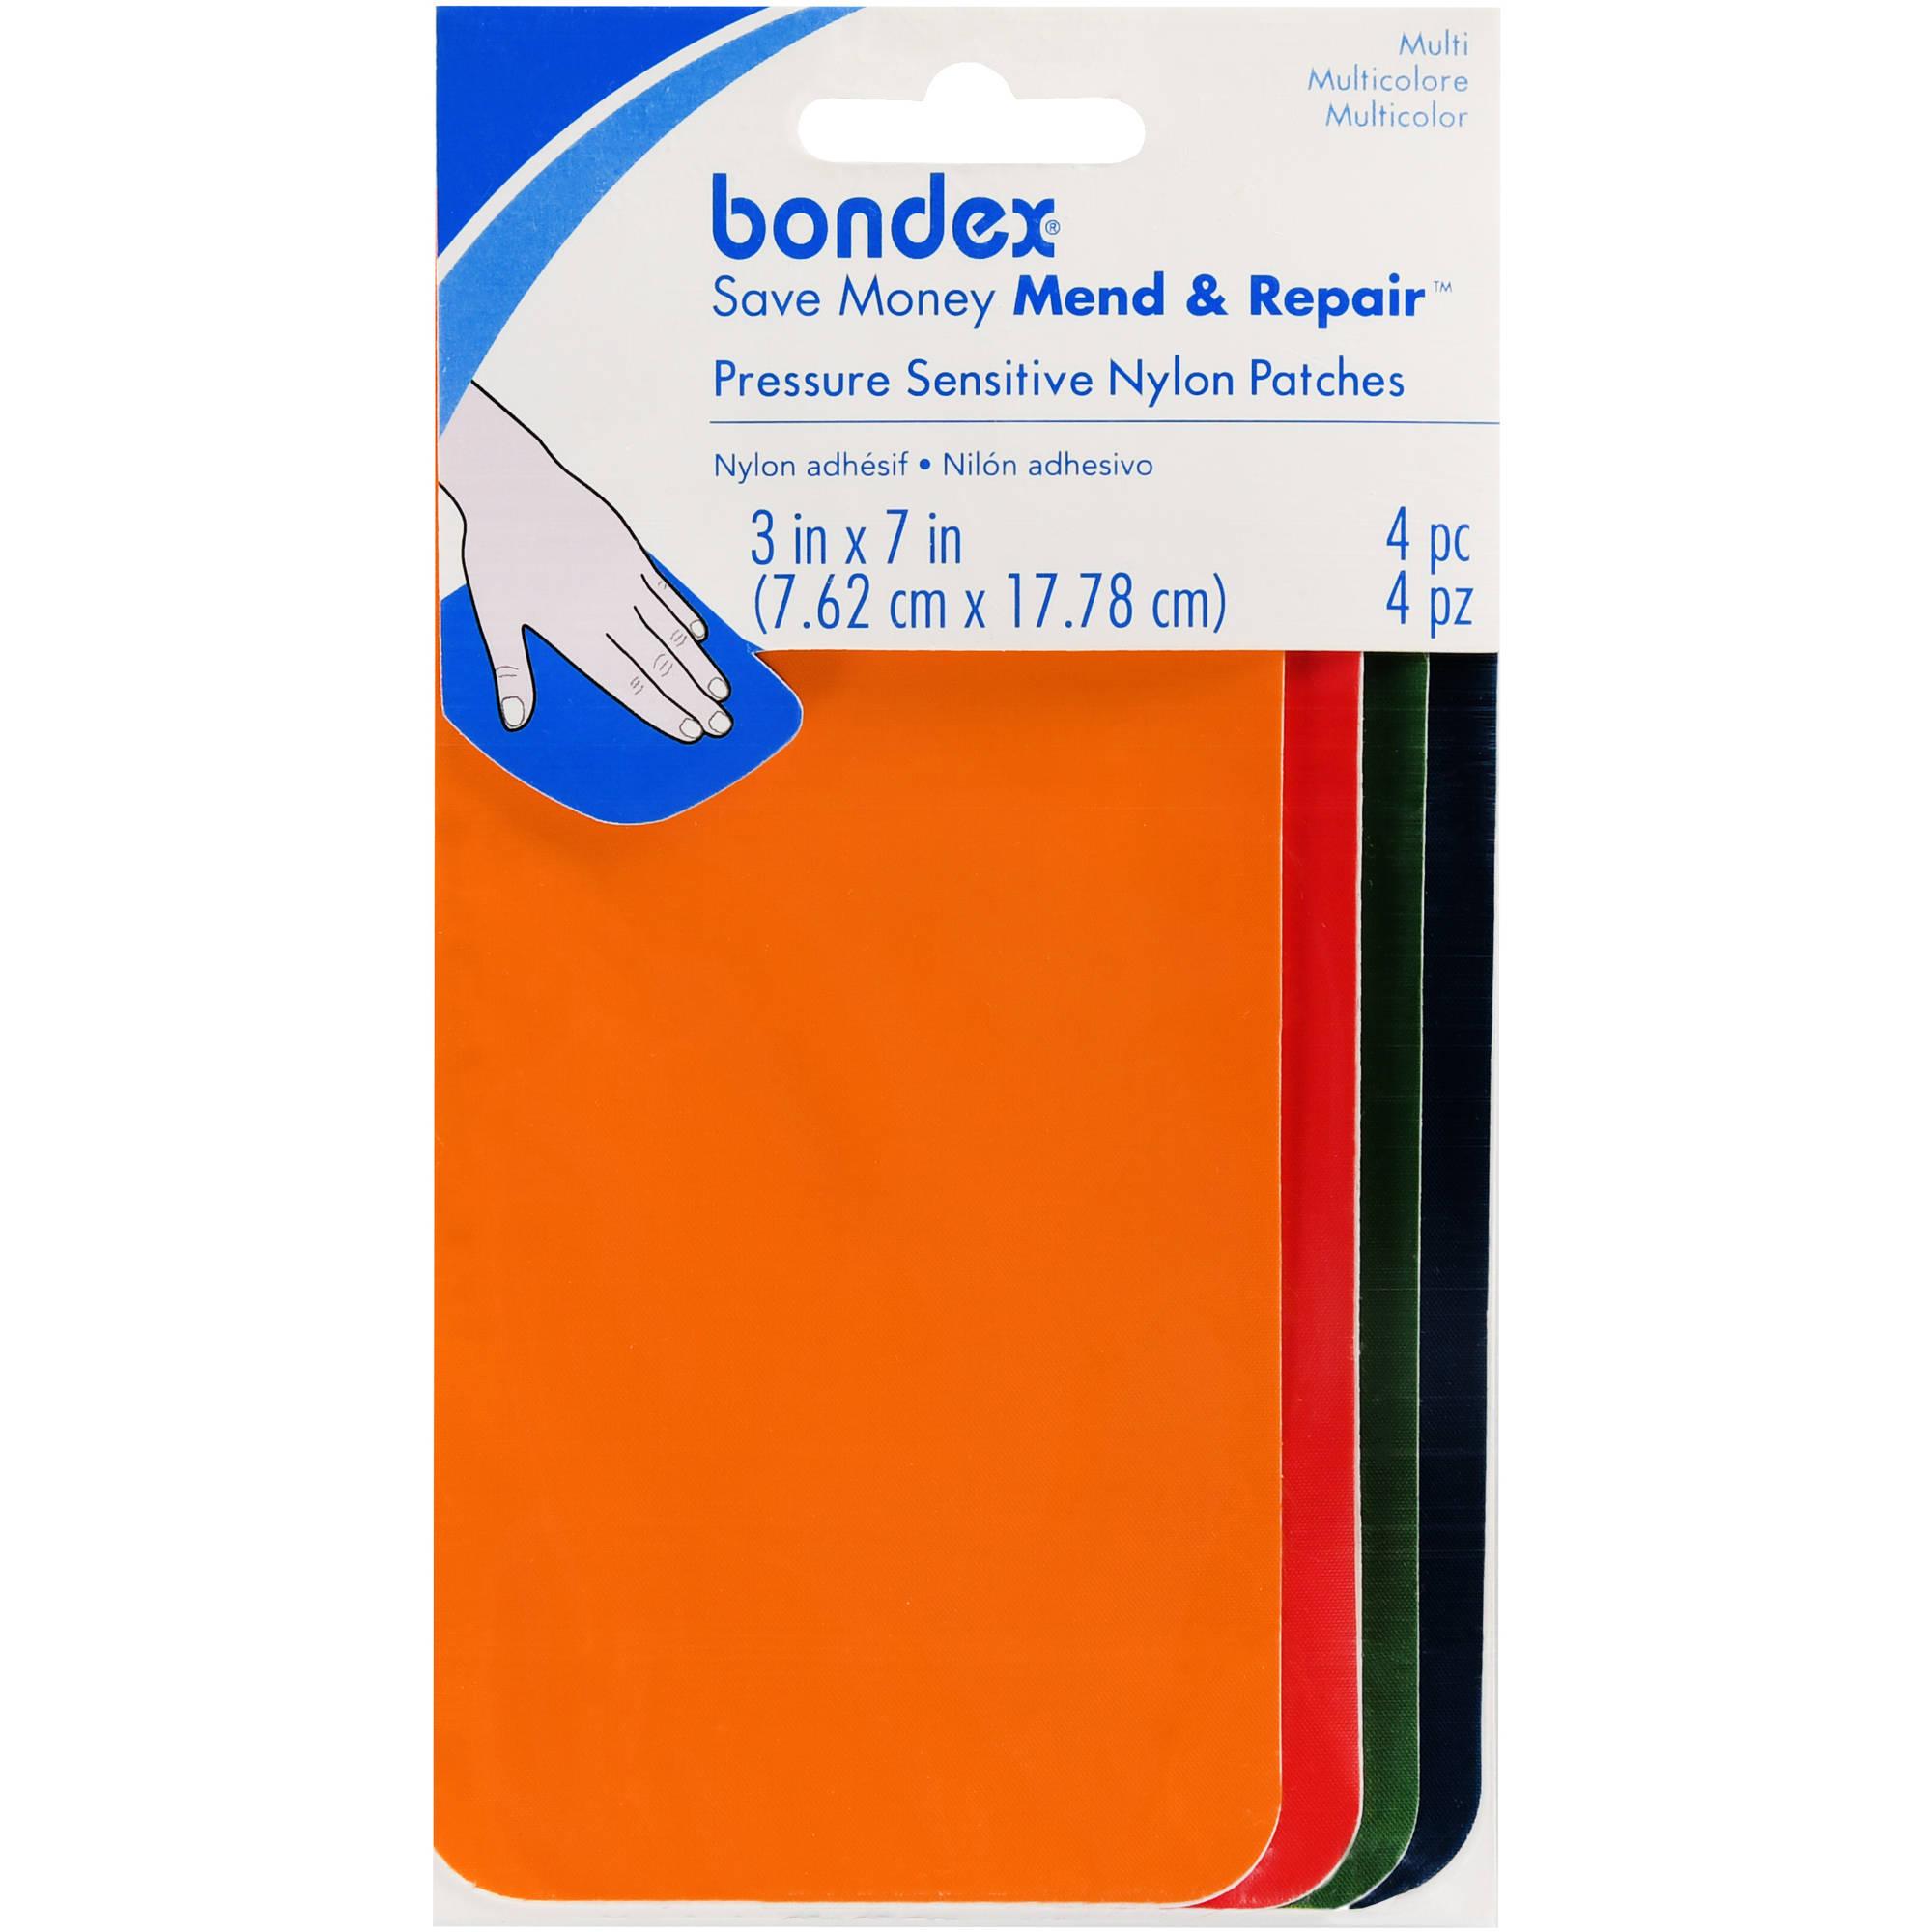 Bondex Pressure Sensitive Nylon Patches, 4 Piece